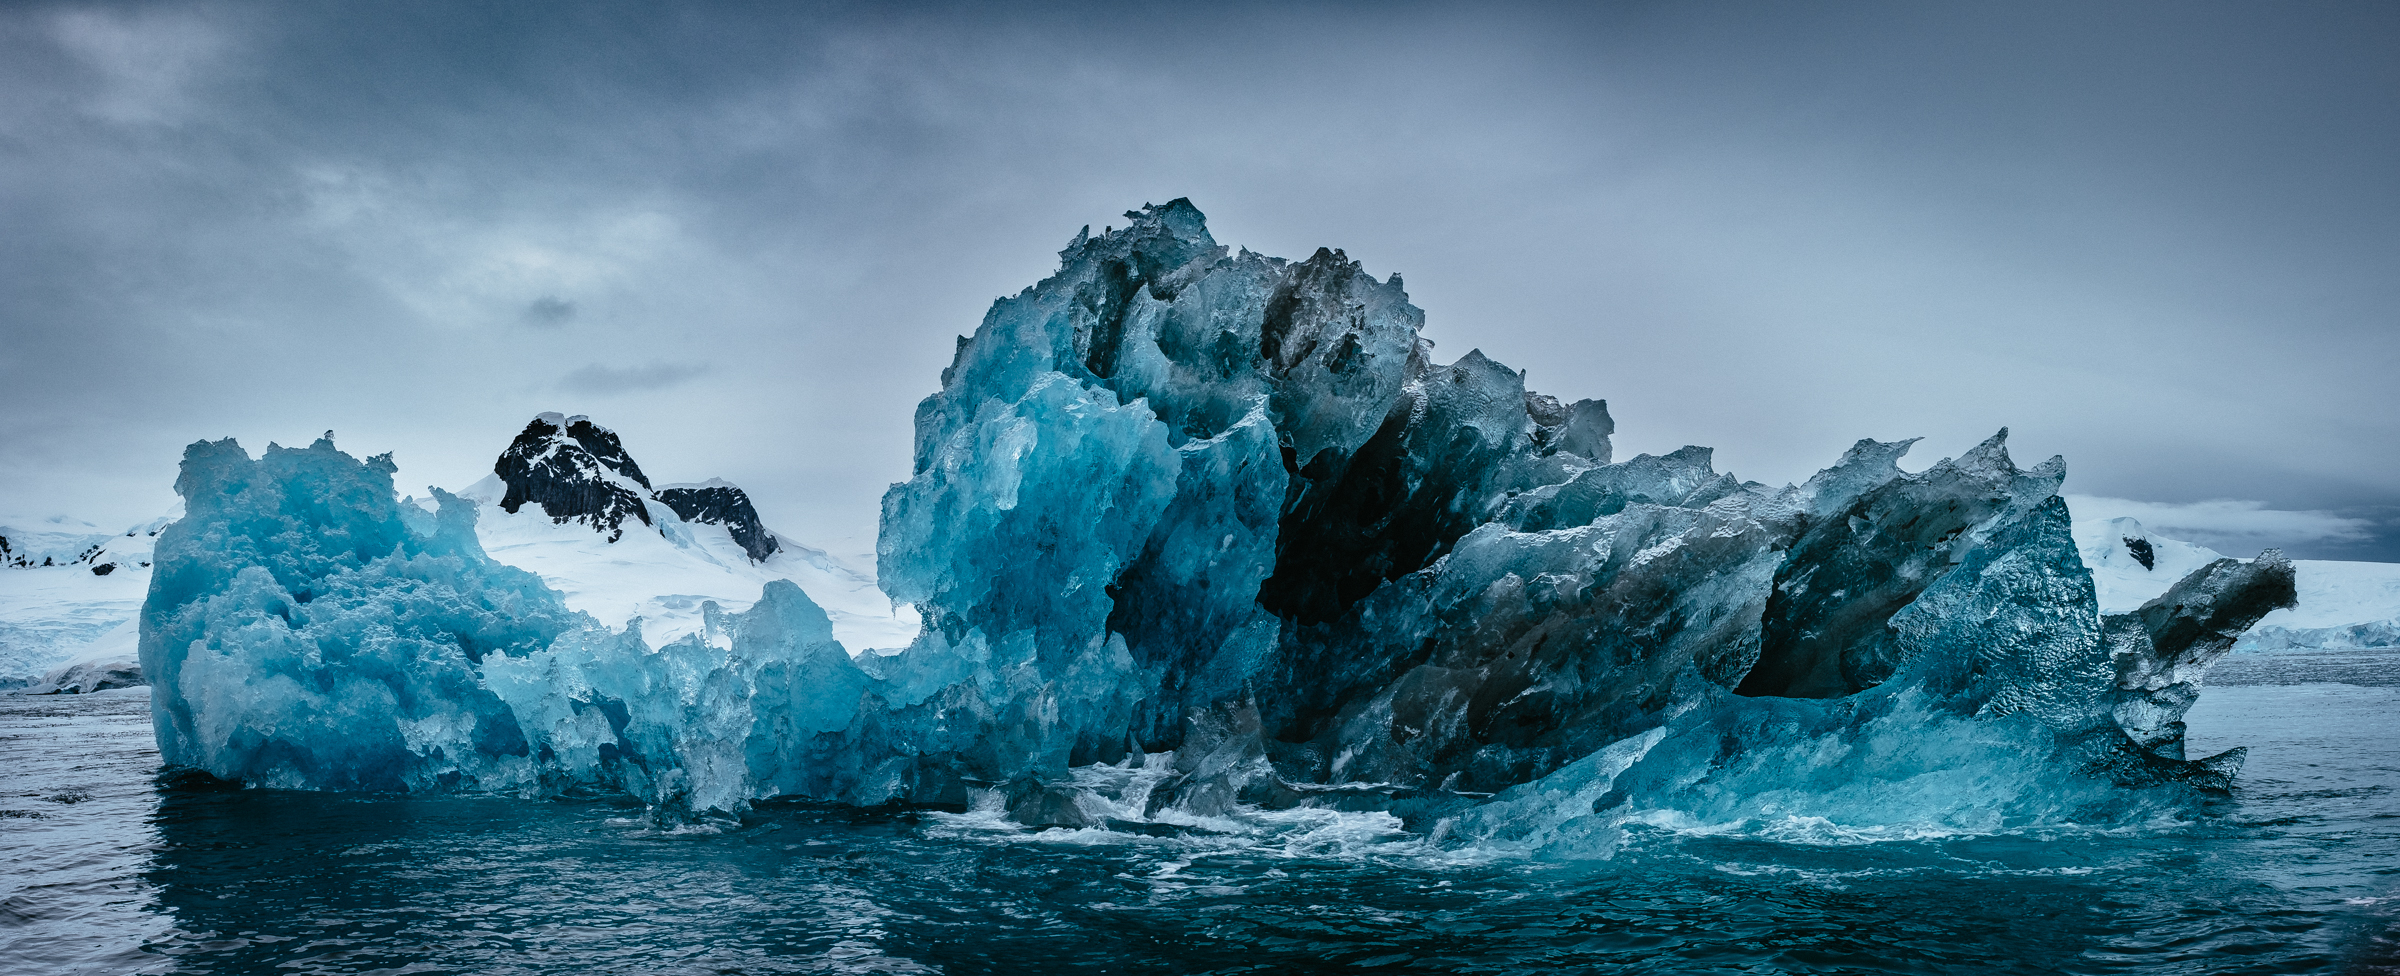 "Crystal Ship. Curtiss Bay, Antarctica    by Rollence Patugan, $1,200  20"" x 38"""